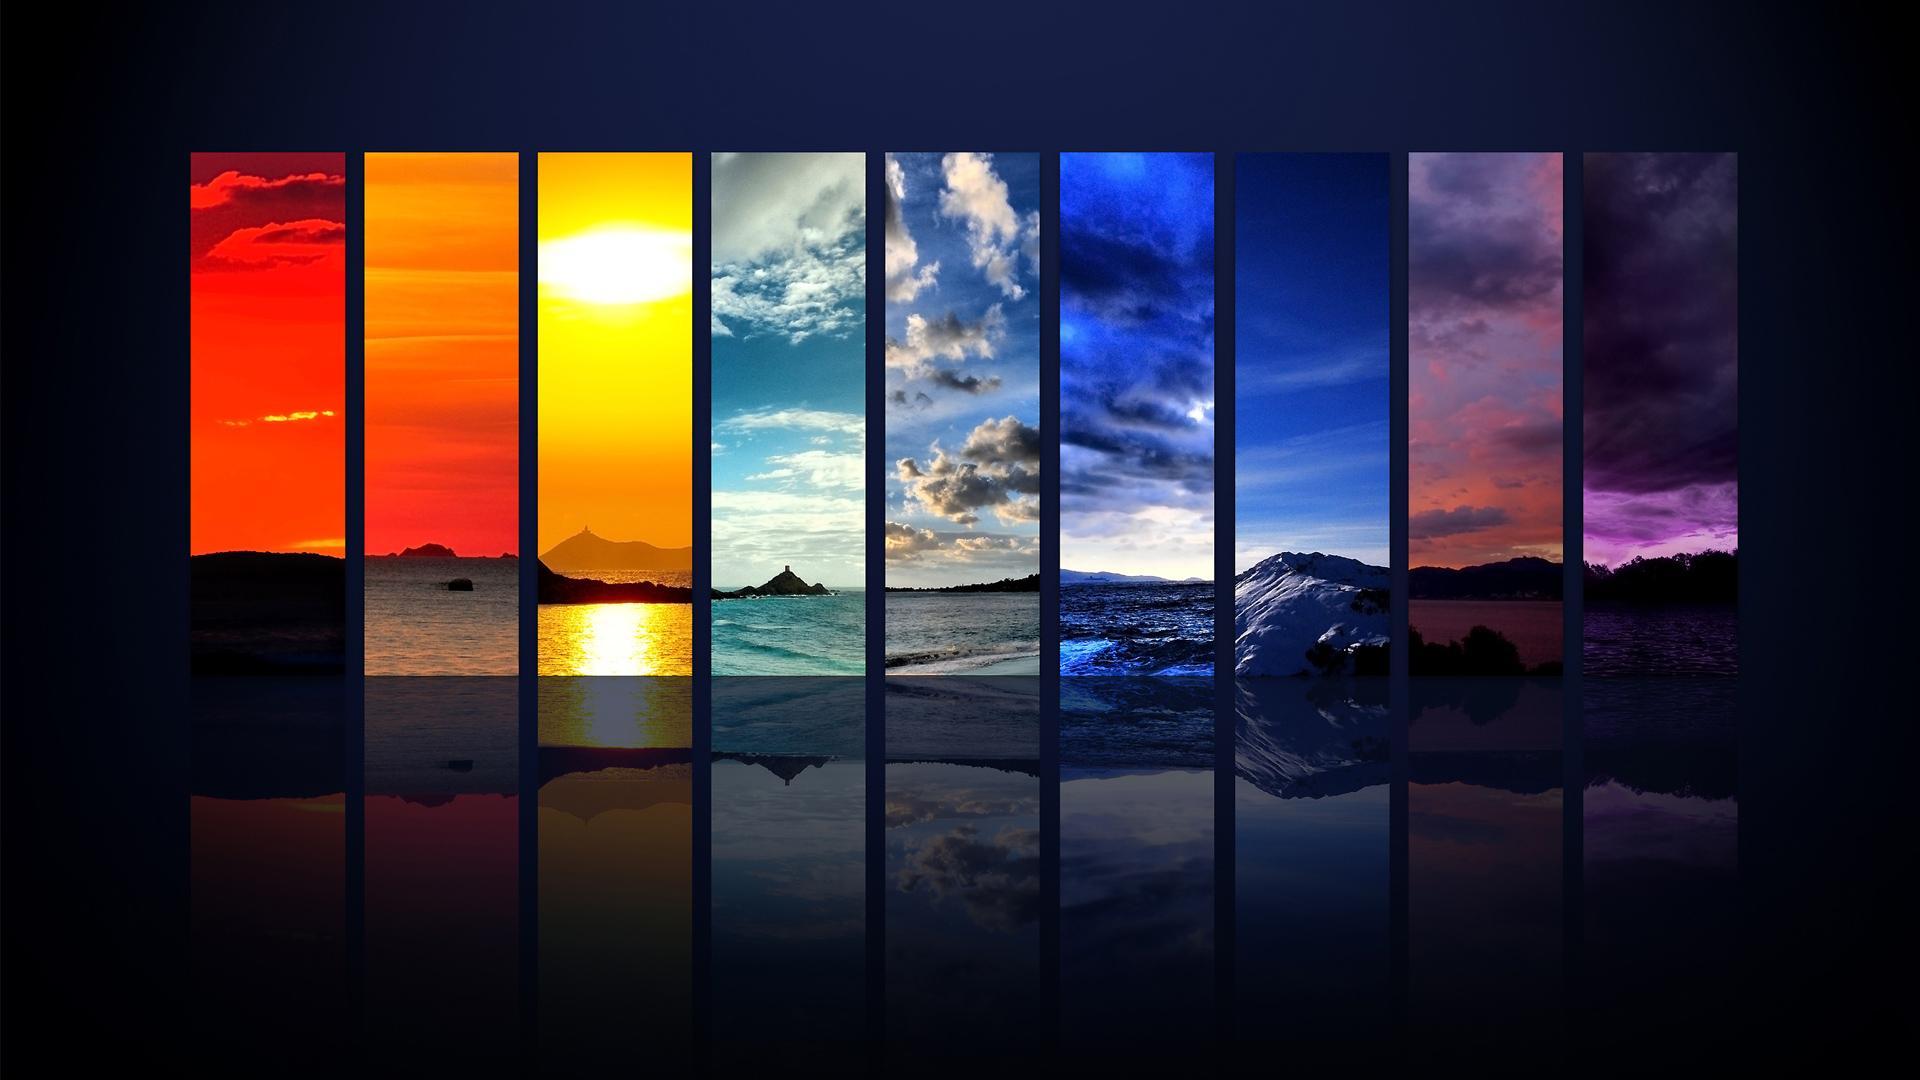 Abstract Desktop Wallpaper Hd Widescreen 1080p For Computer Windows 10 Hd Background